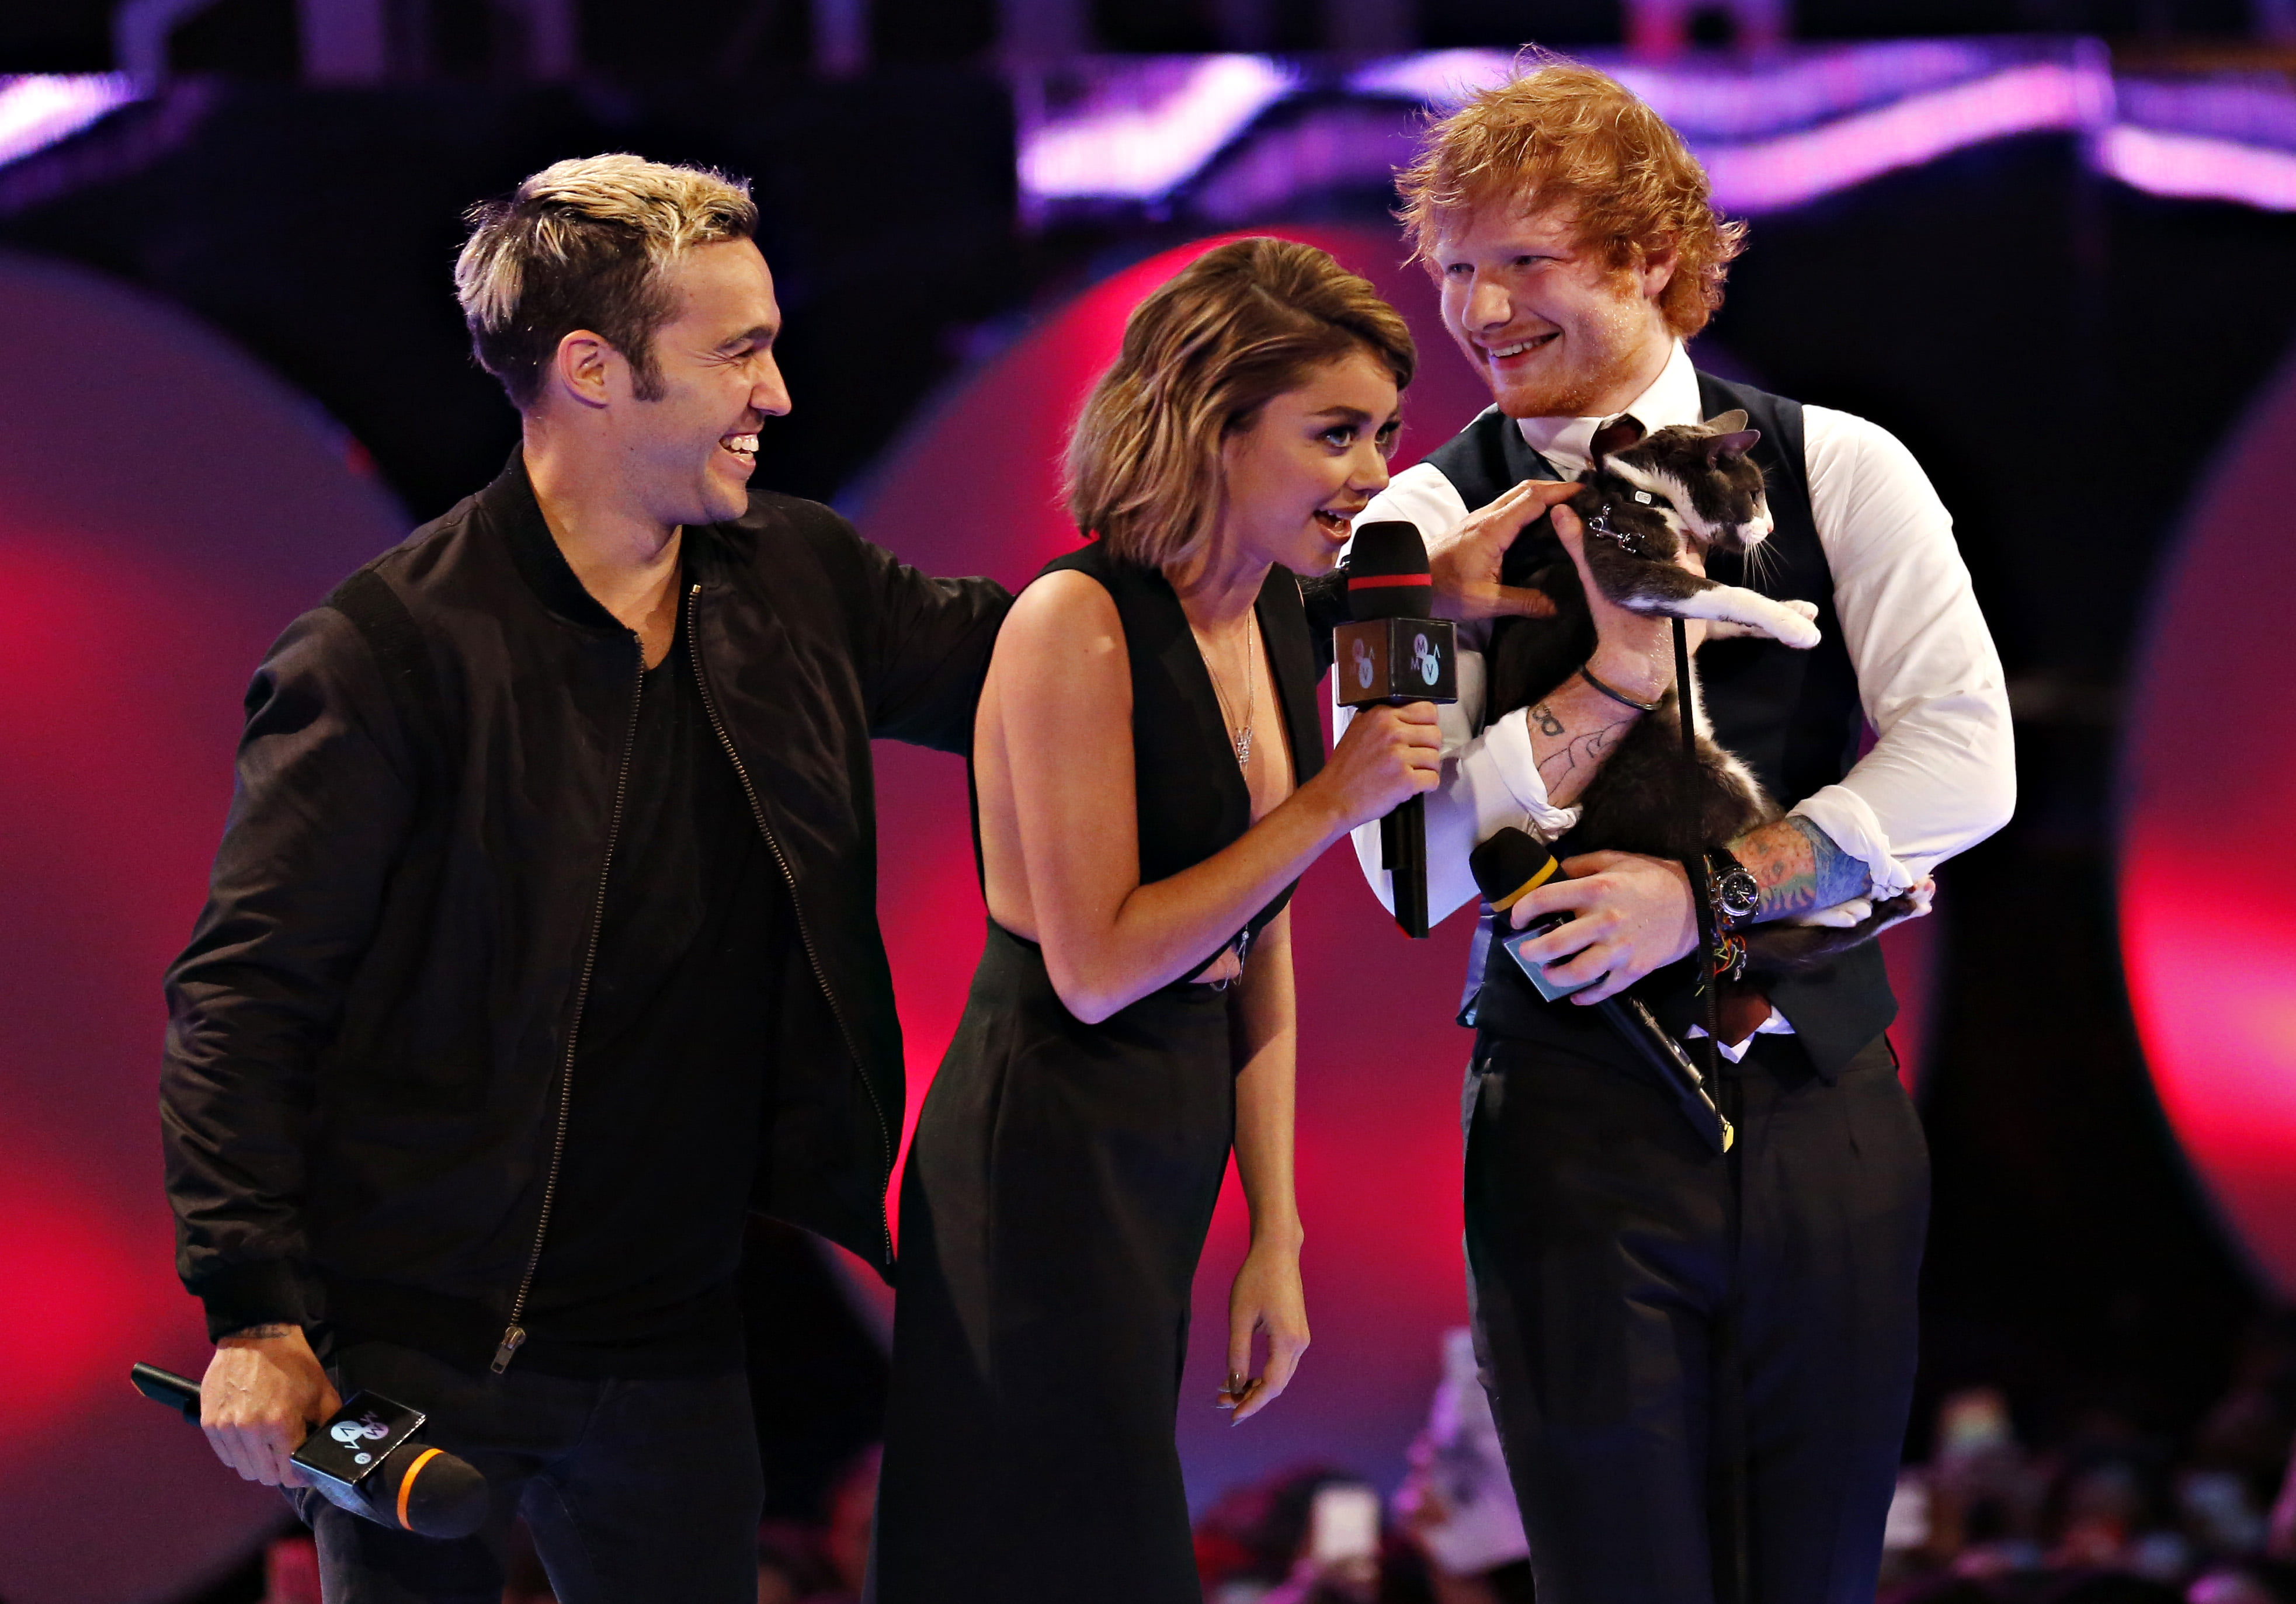 Pete Wentz, Sarah Hyland & Ed Sheeran